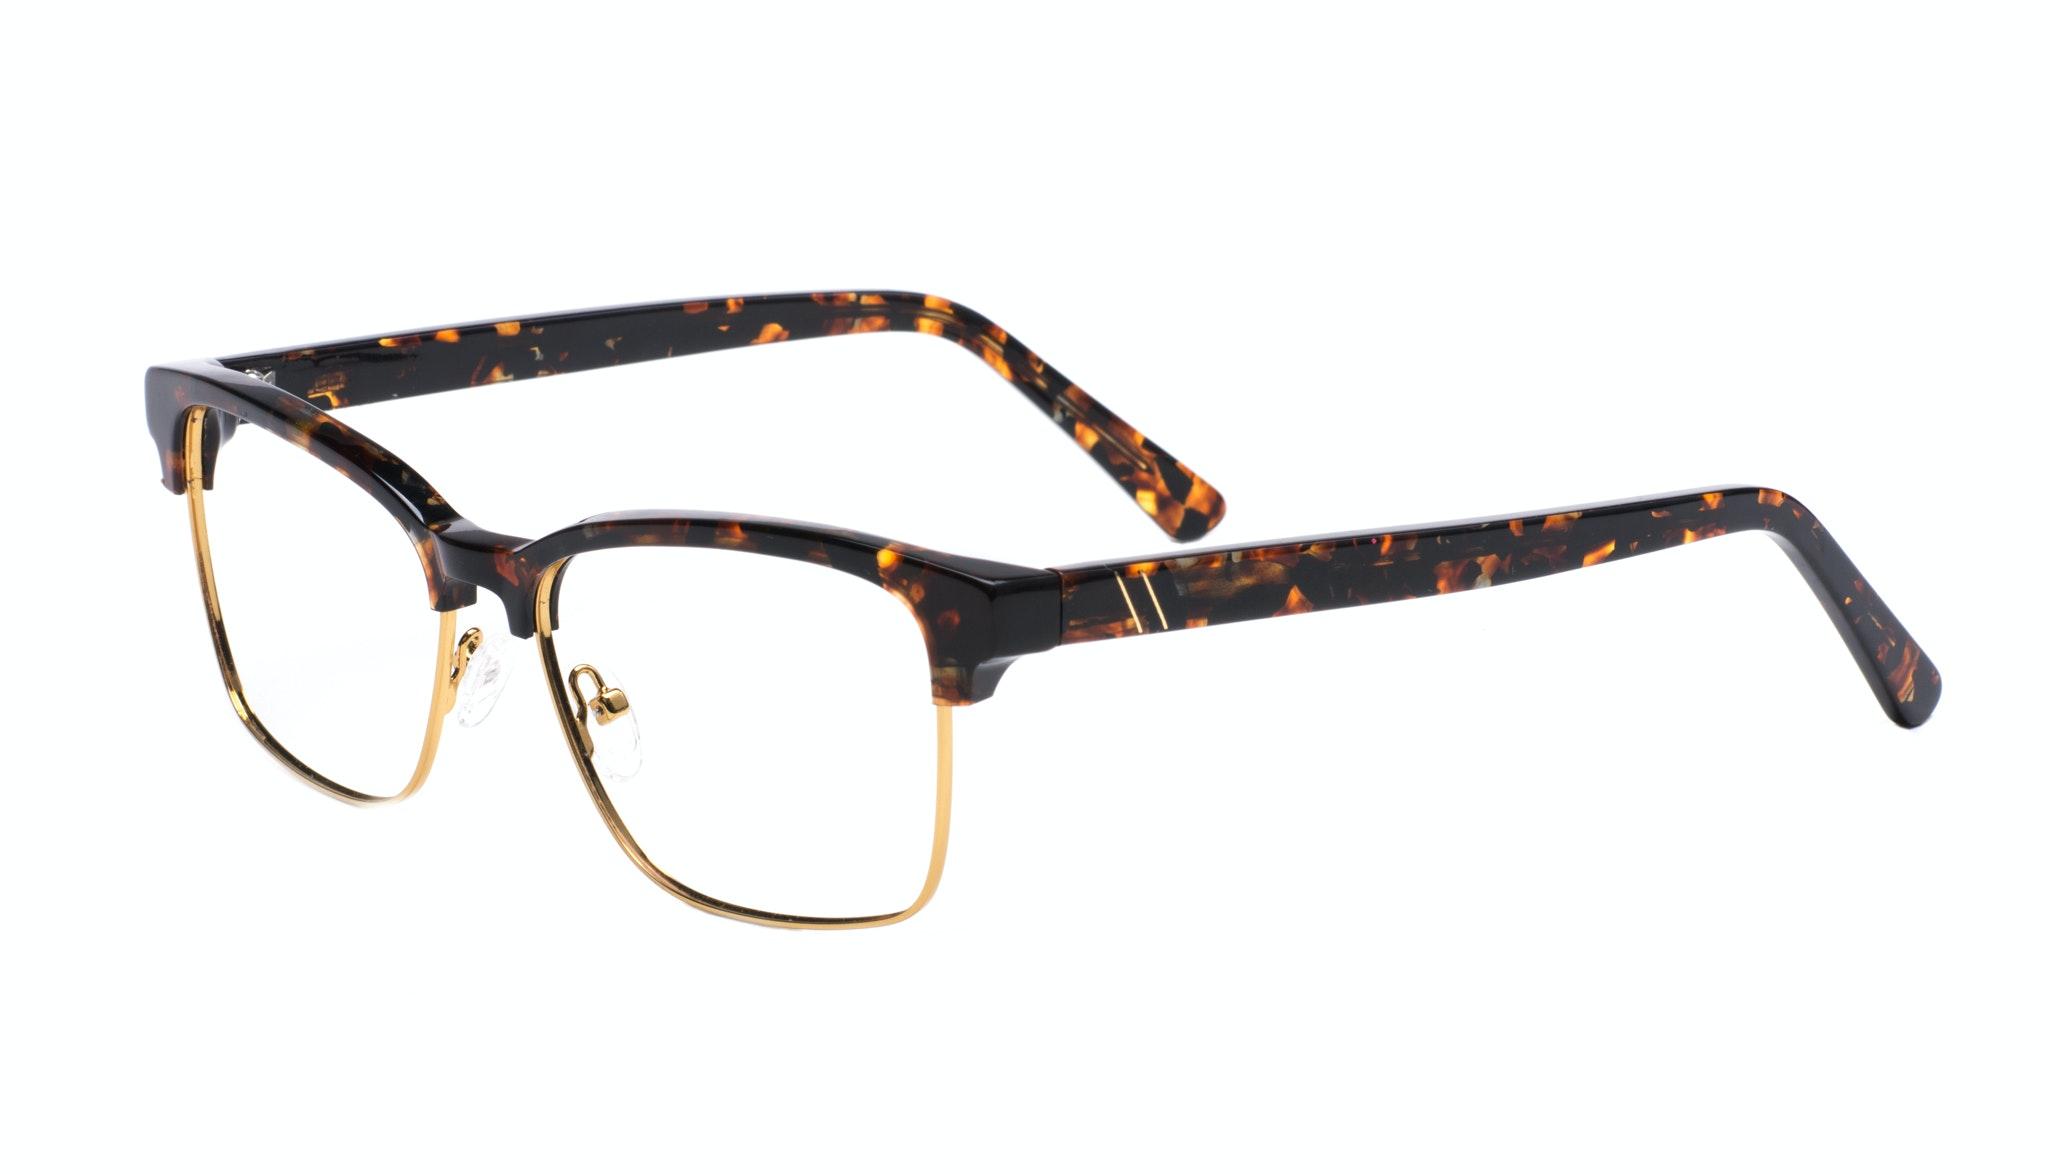 Affordable Fashion Glasses Rectangle Square Eyeglasses Men Gallery Mahogany Tilt